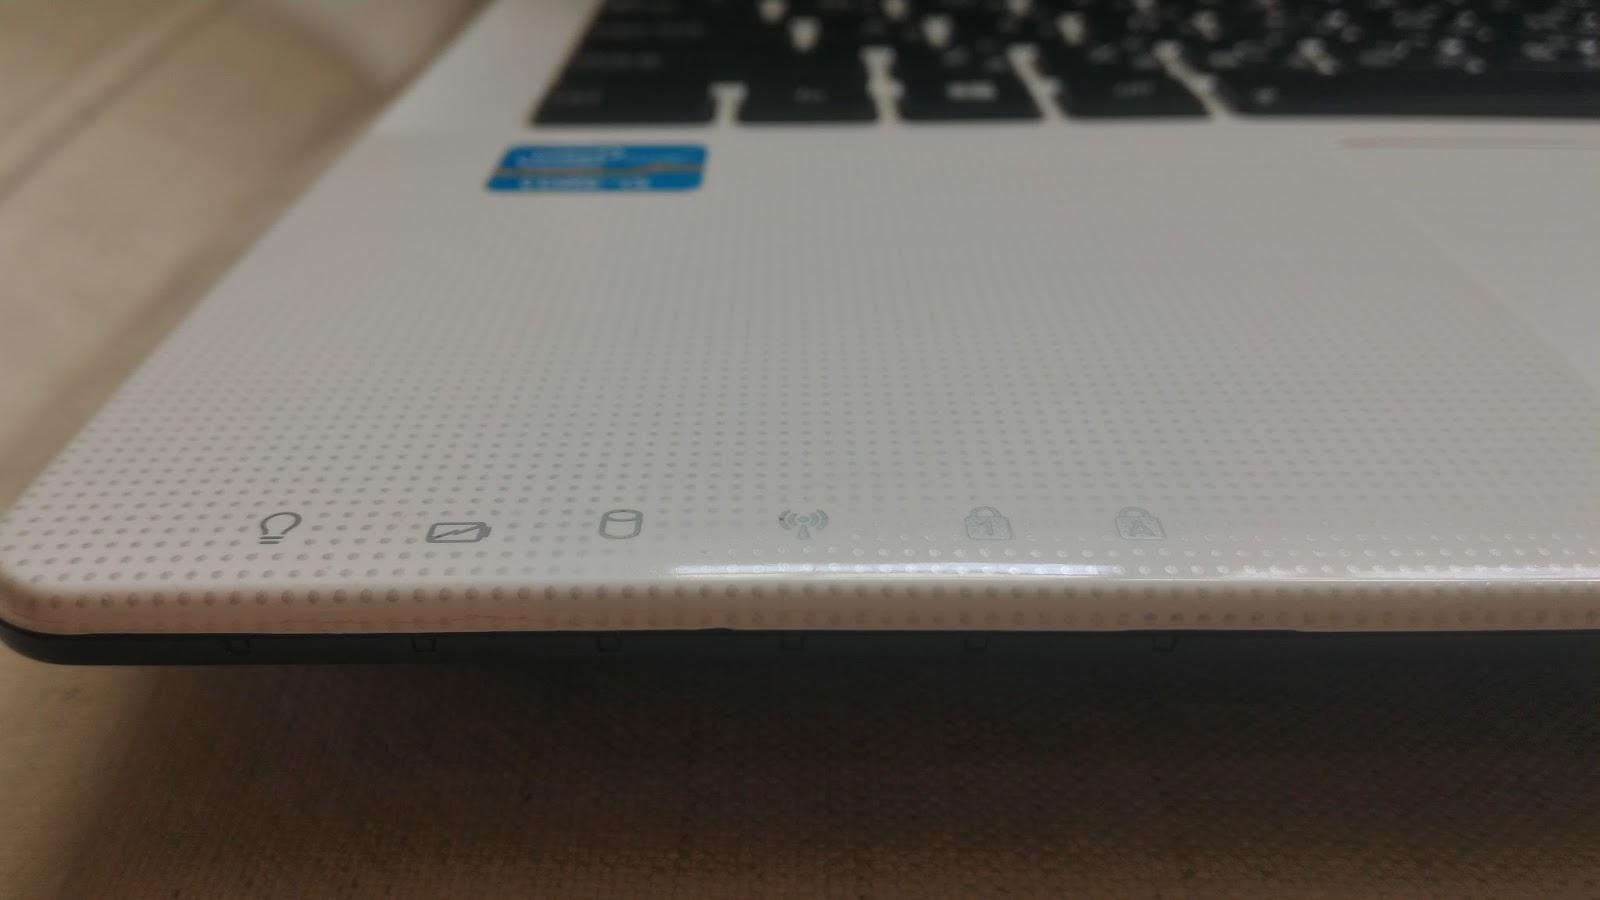 P 20160723 110201 SRES - [開箱] Asus K55VD i5-3230M 高效能 2G 獨顯筆電